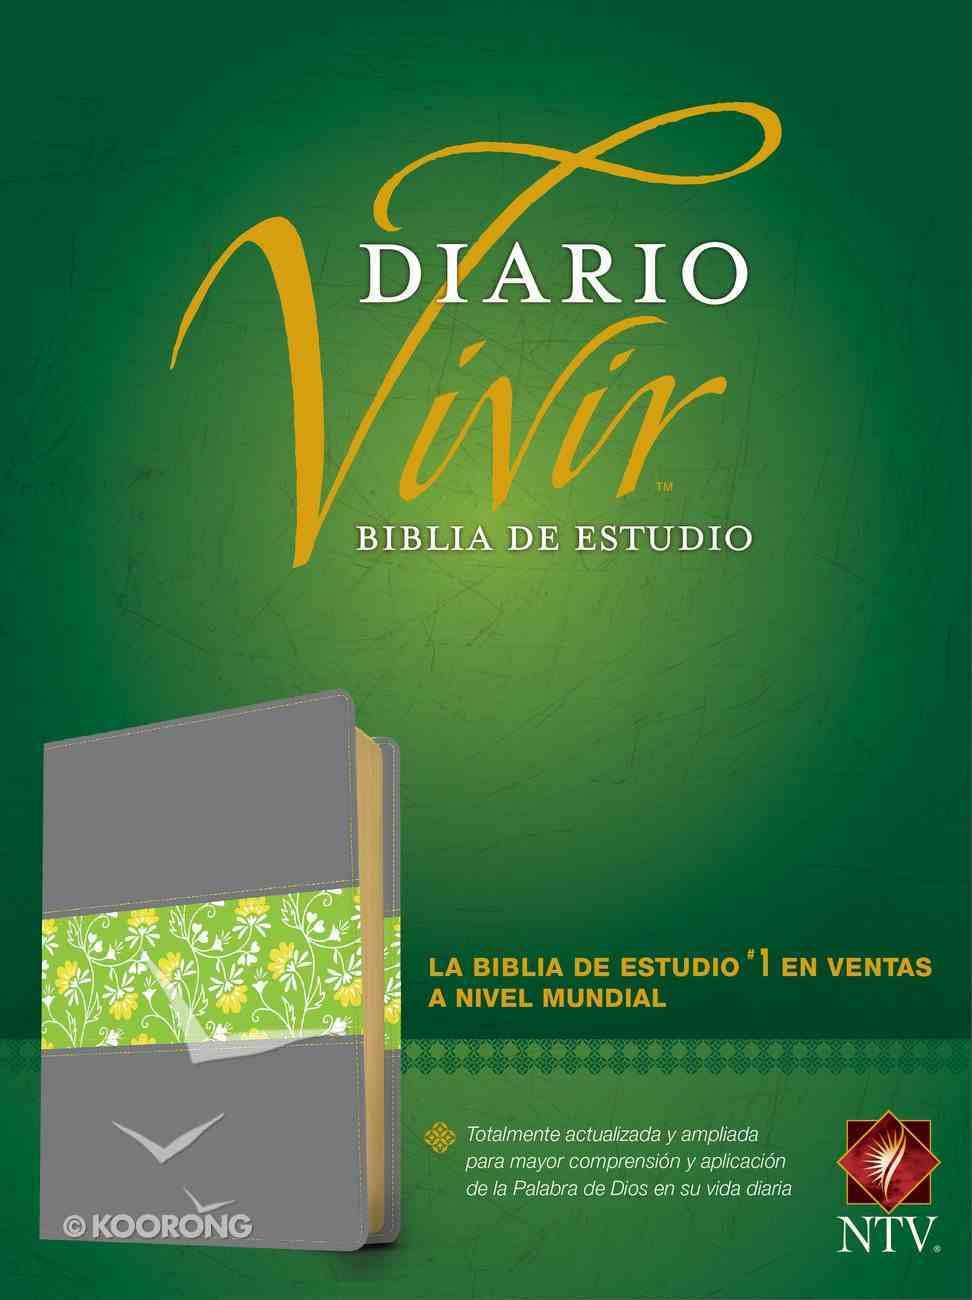 Ntv Biblia De Estudio Del Diario Vivir Indexed Gray/Green (Red Letter Edition) Imitation Leather